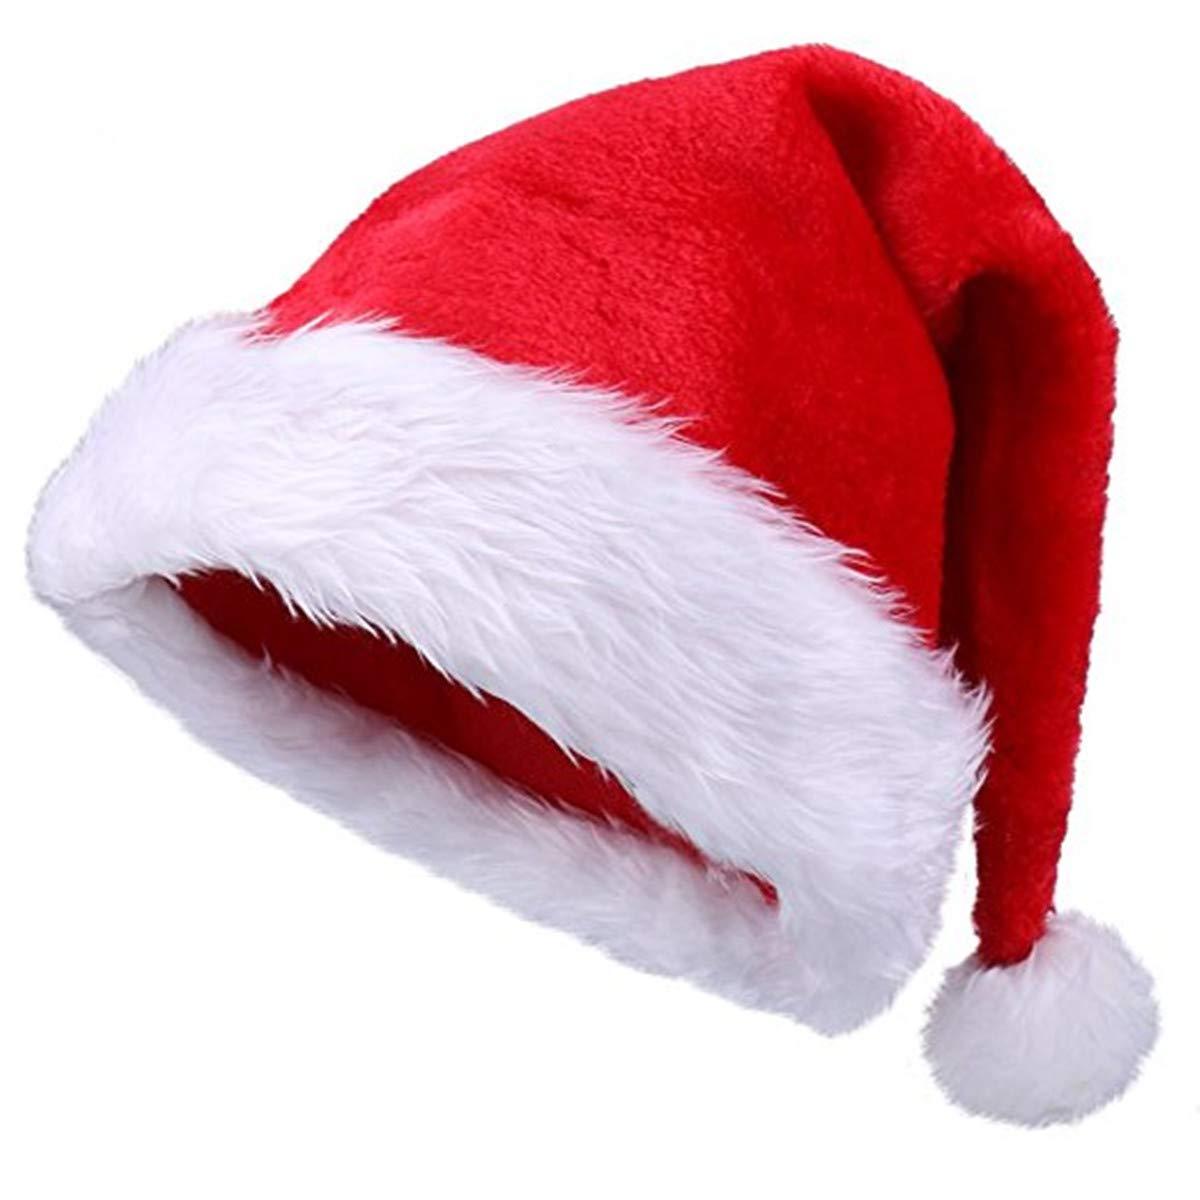 Christmas Hat.Yansanido 18 5 Adult Santa Hat Double Liner Christmas Hat Santa Christmas Hat Traditional Red And White Plush Christmas Santa Hat 1 Pack